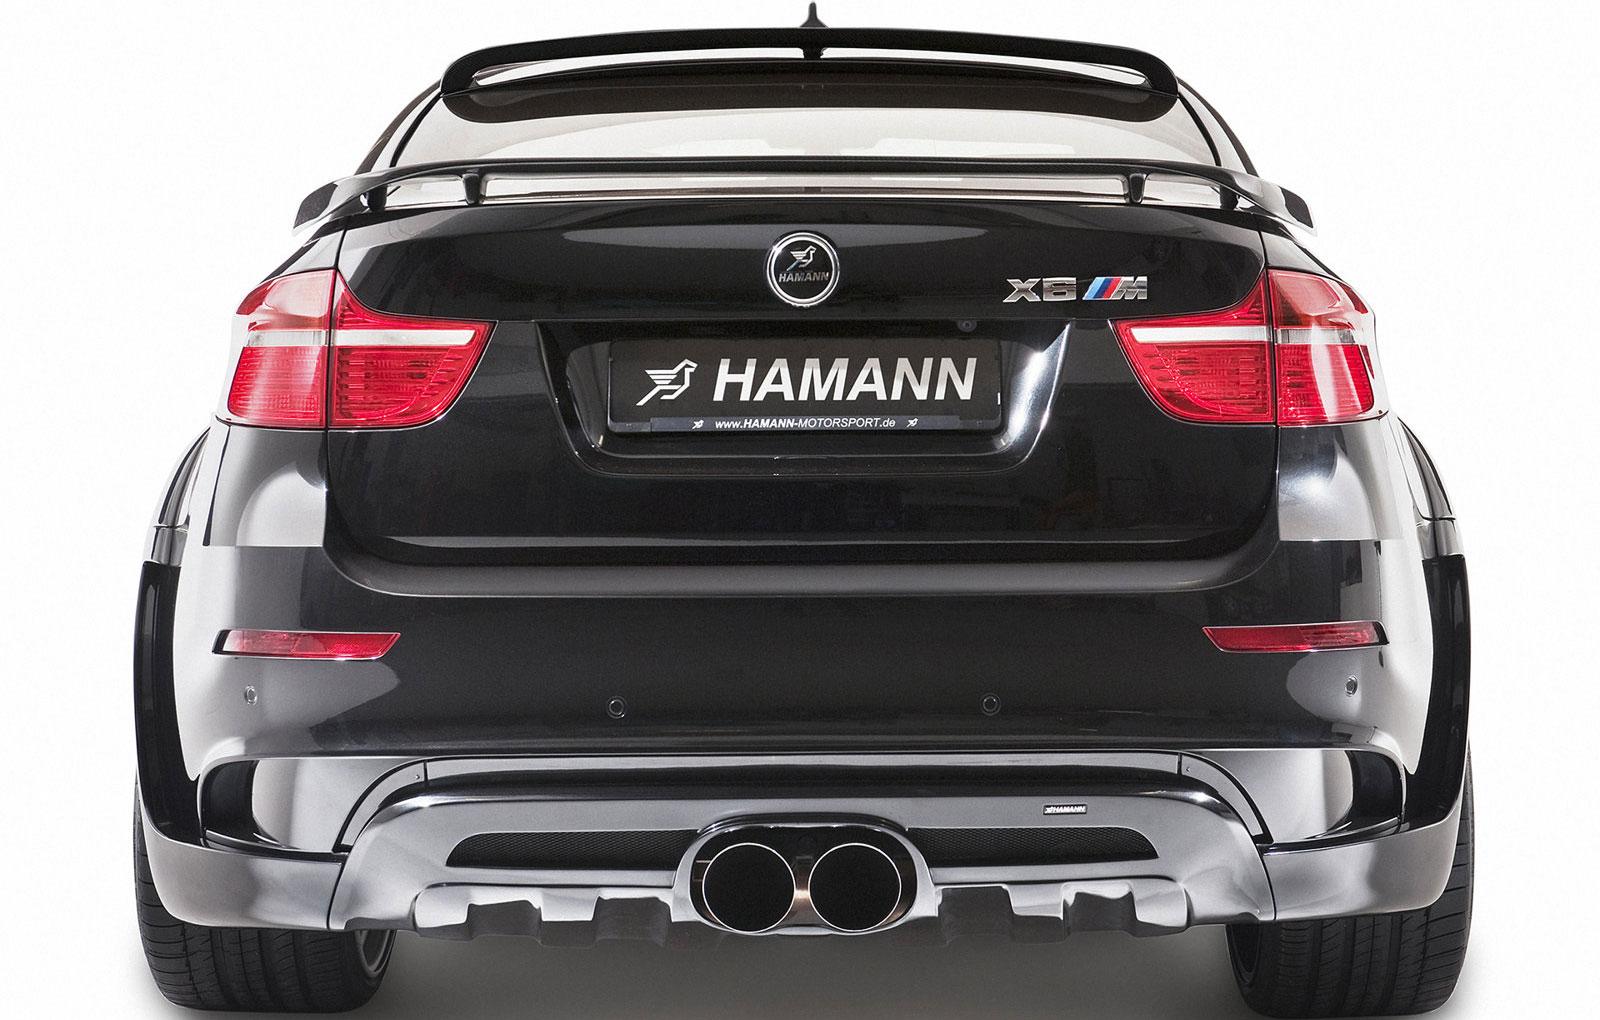 BMW X6 Hamann Tycoon Evo M debuted at Geneva